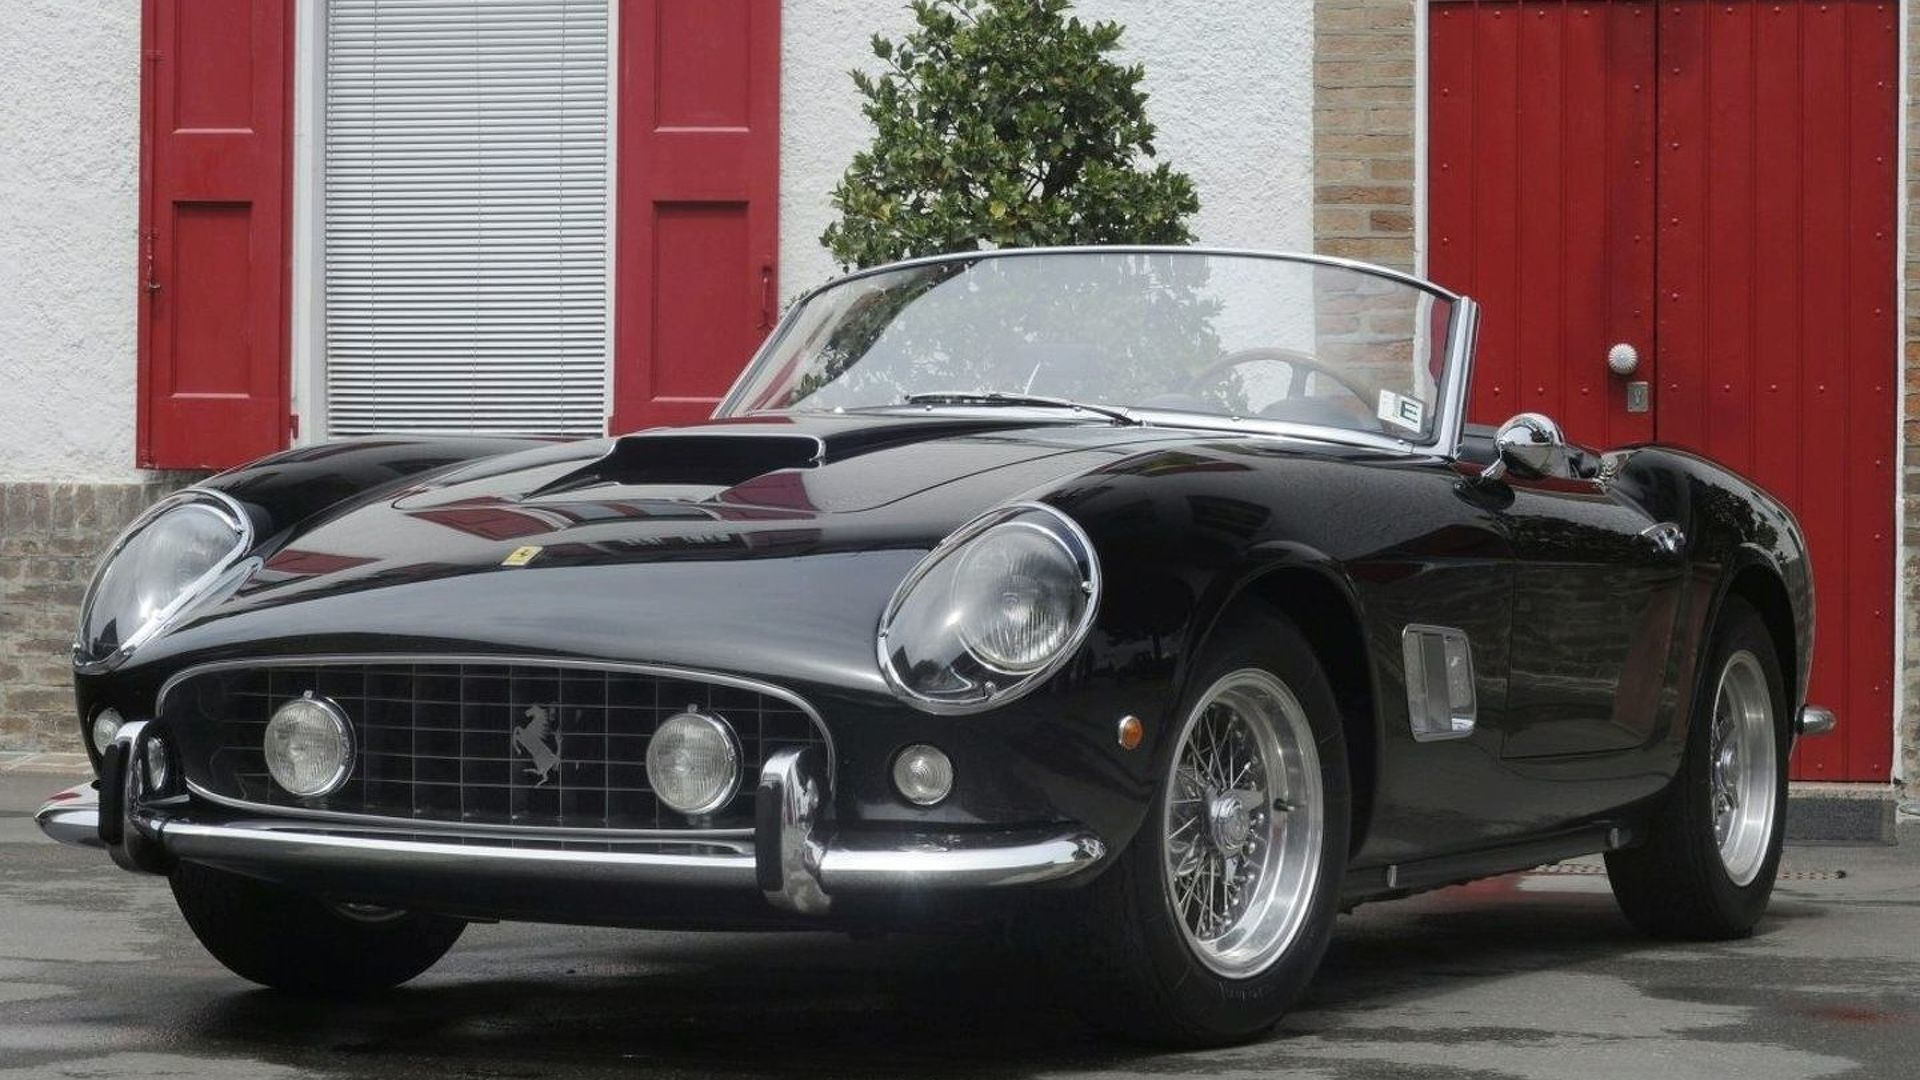 Radio Dj Chris Evans Buys 1961 Ferrari 250 Gt Swb California Spyder For 10 9 Million